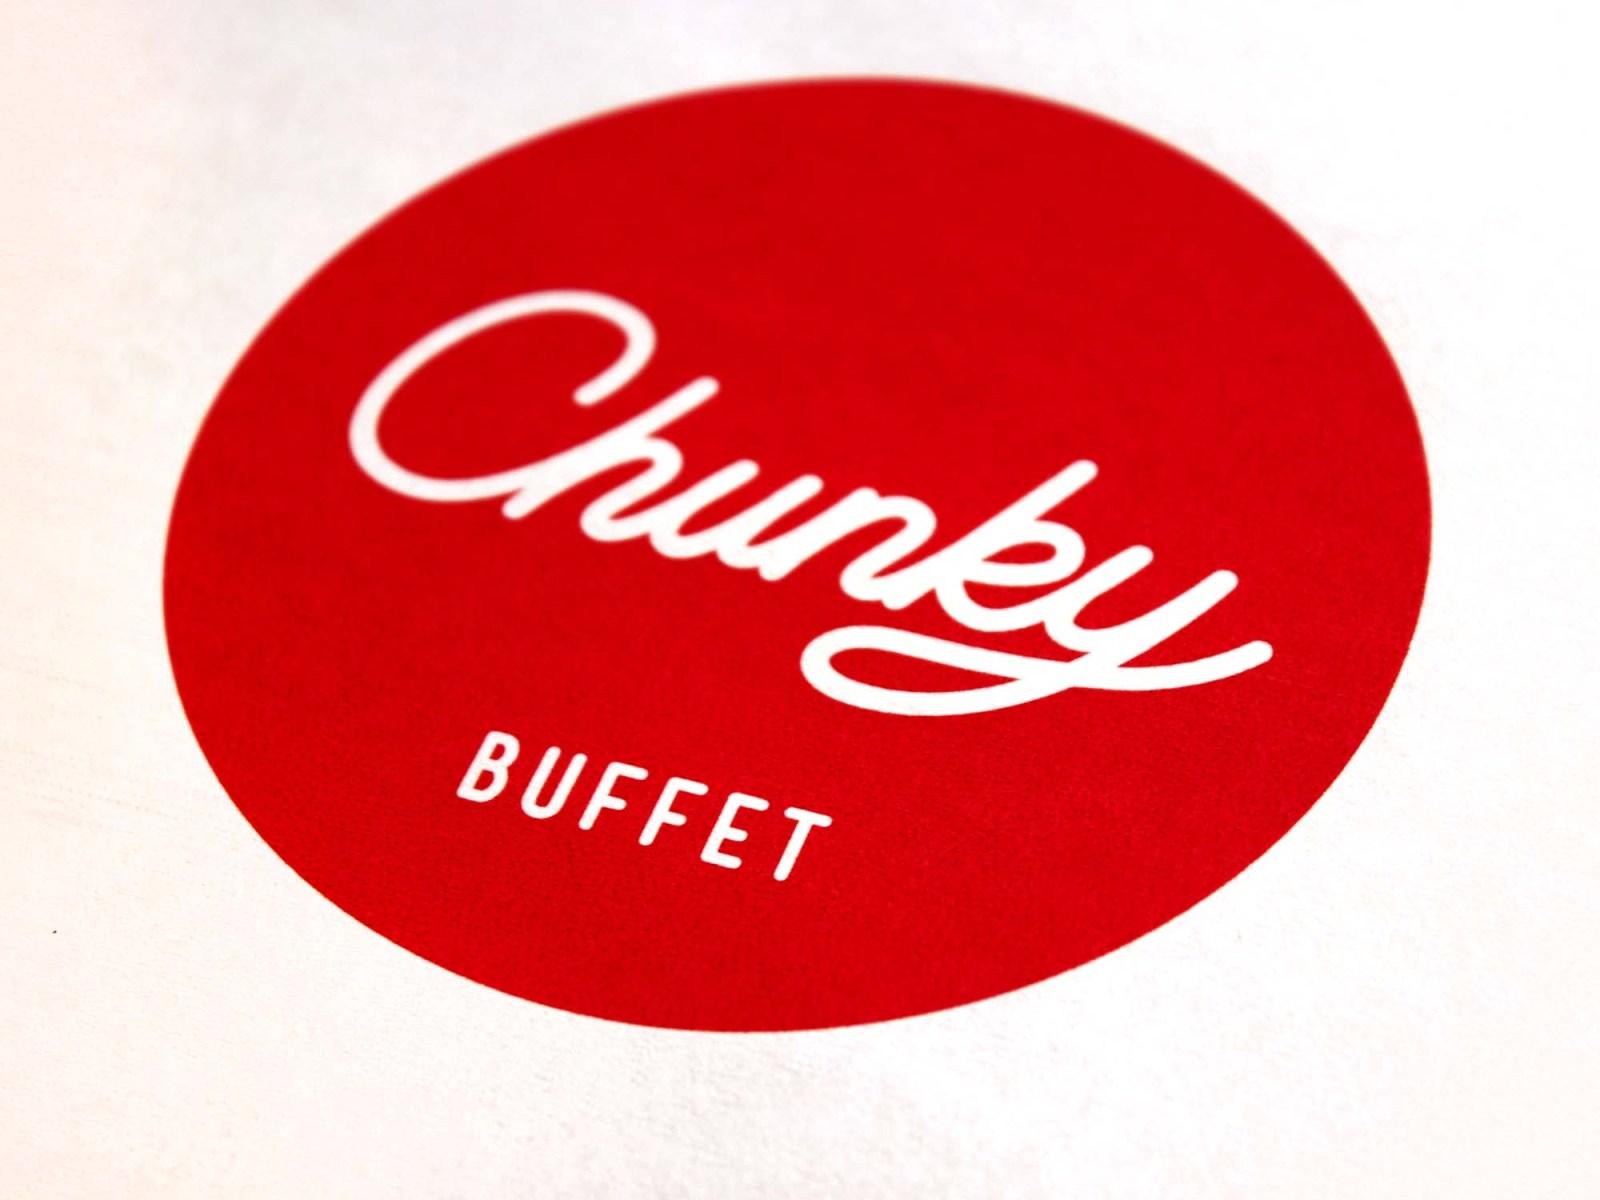 Chunky-Buffet-logo_0004_Layer 13